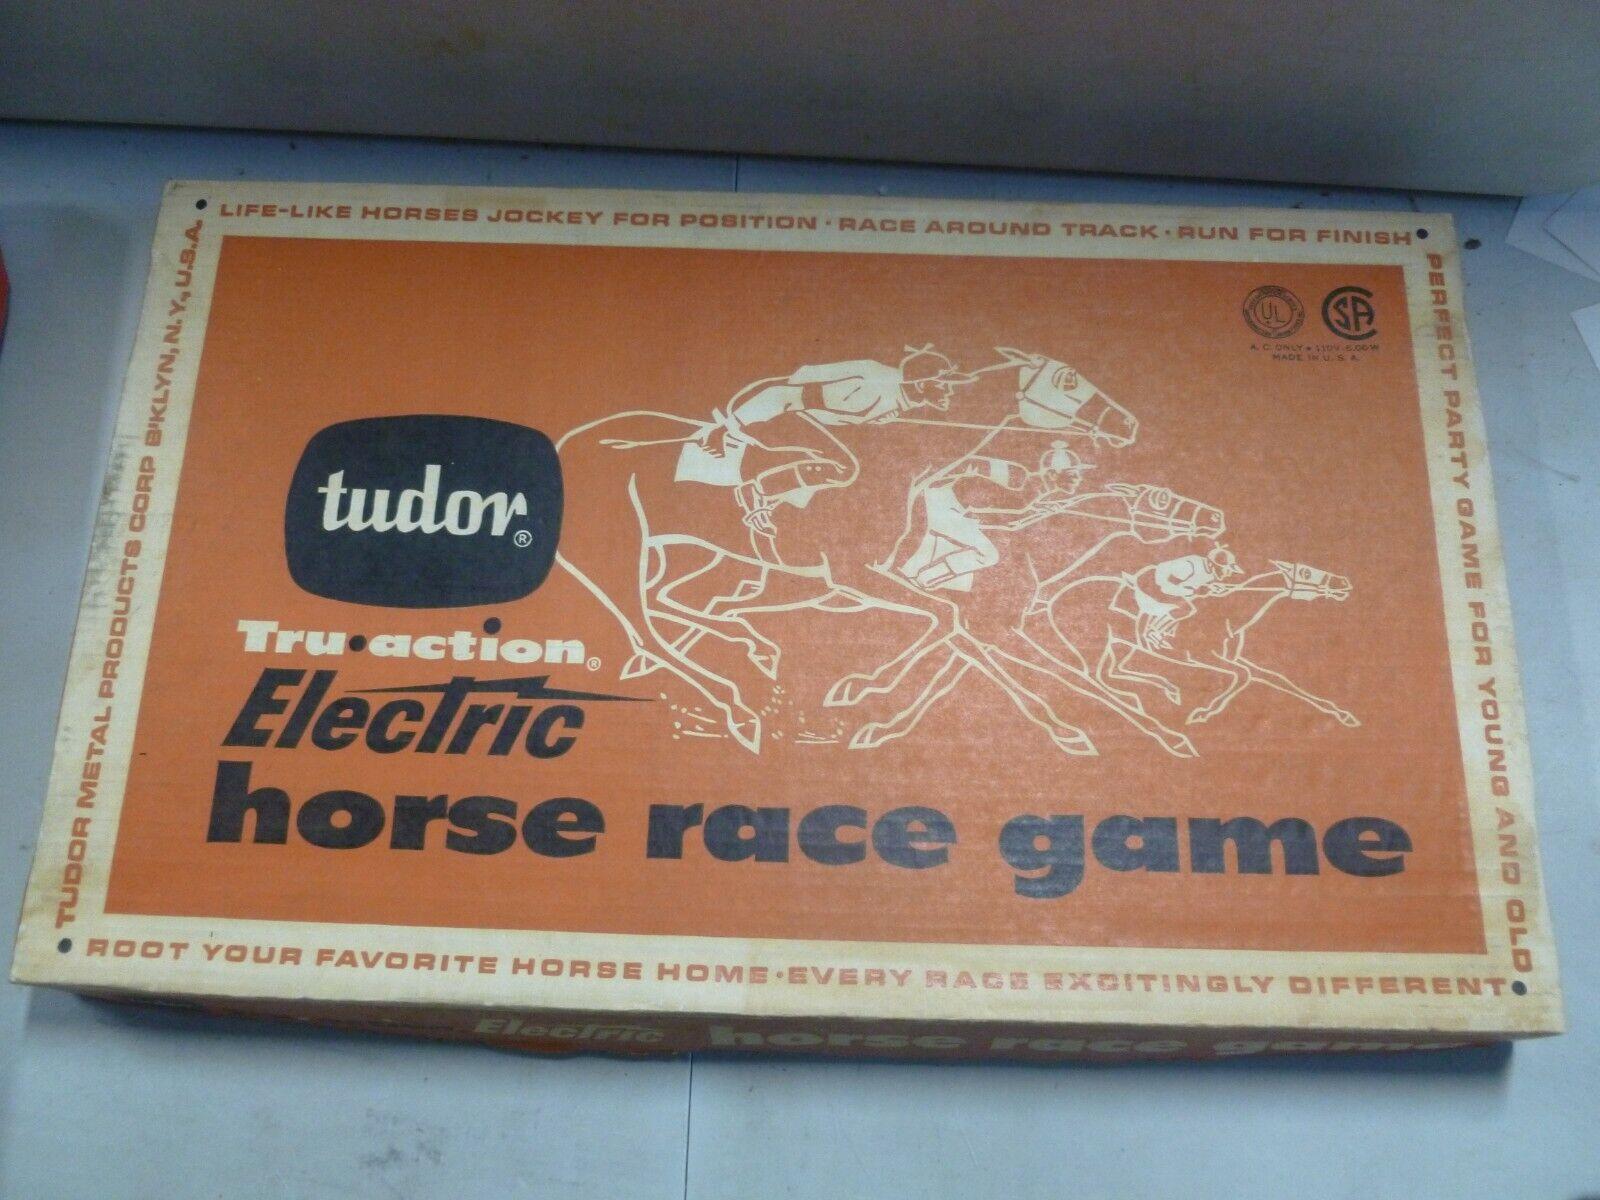 Tudor Electric Horse Race Game